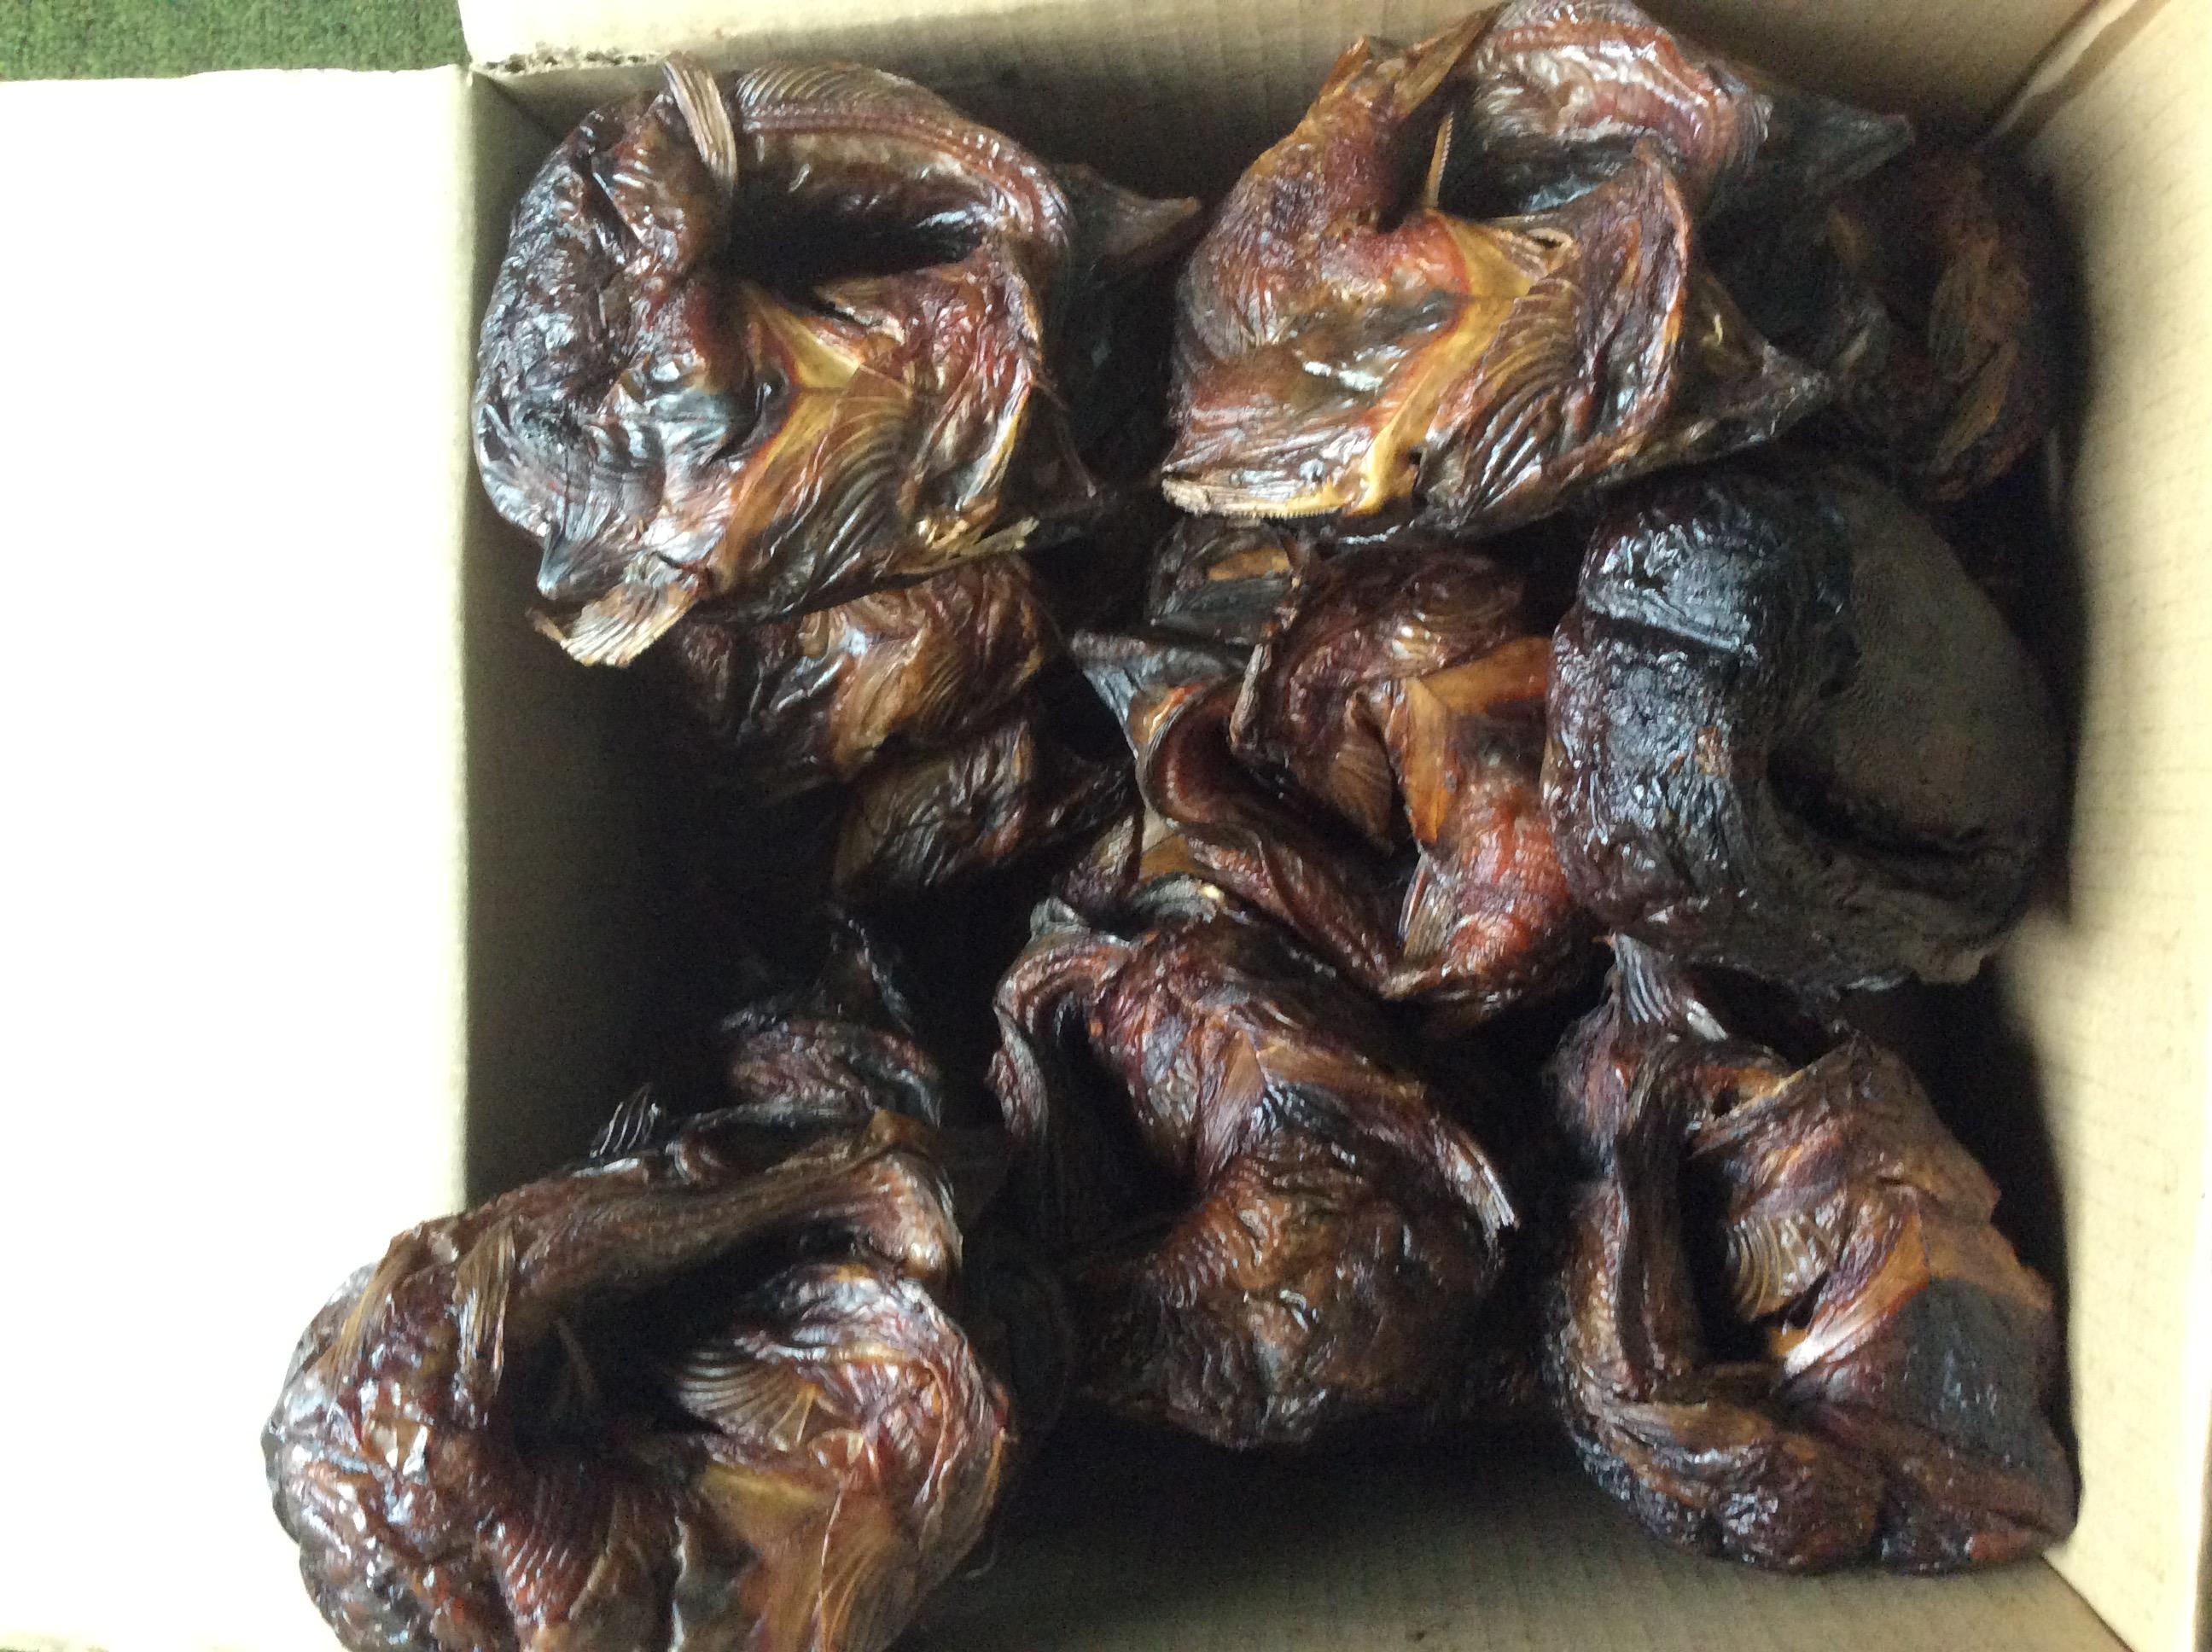 Dry fish market in Nigeria